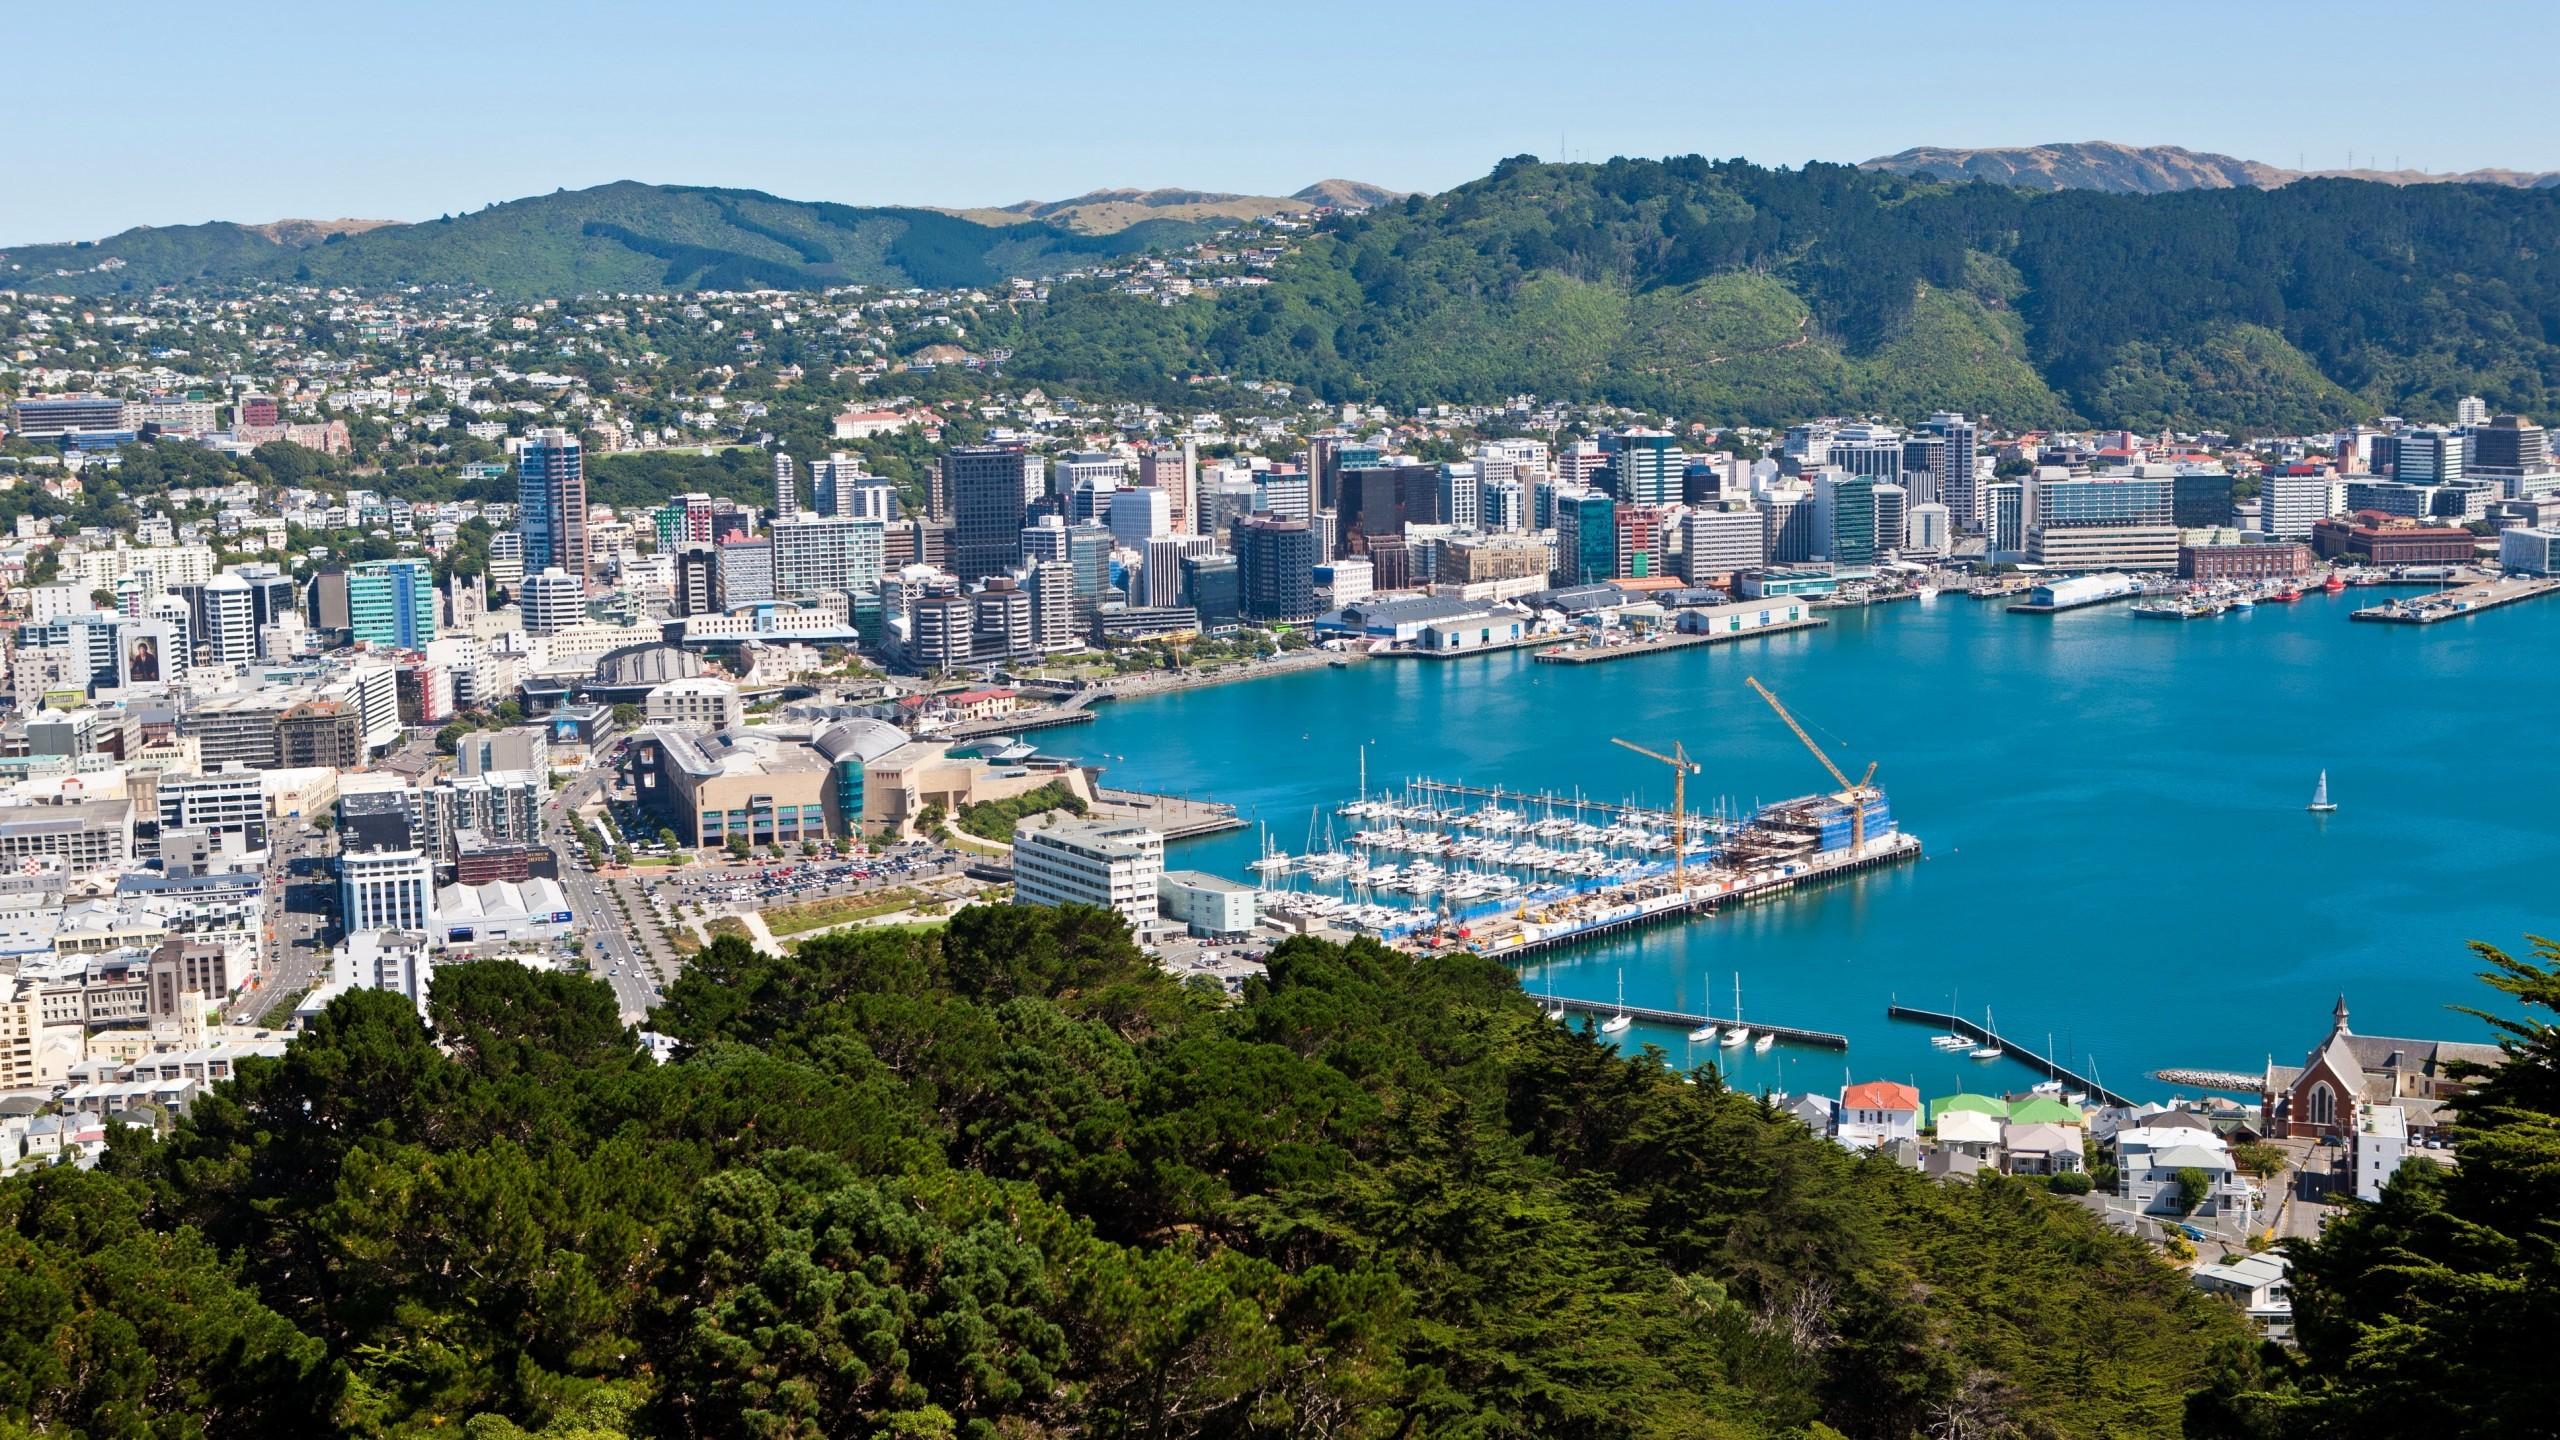 Download 2560x1440 Cityscape New Zealand Wellington Coast 2560x1440